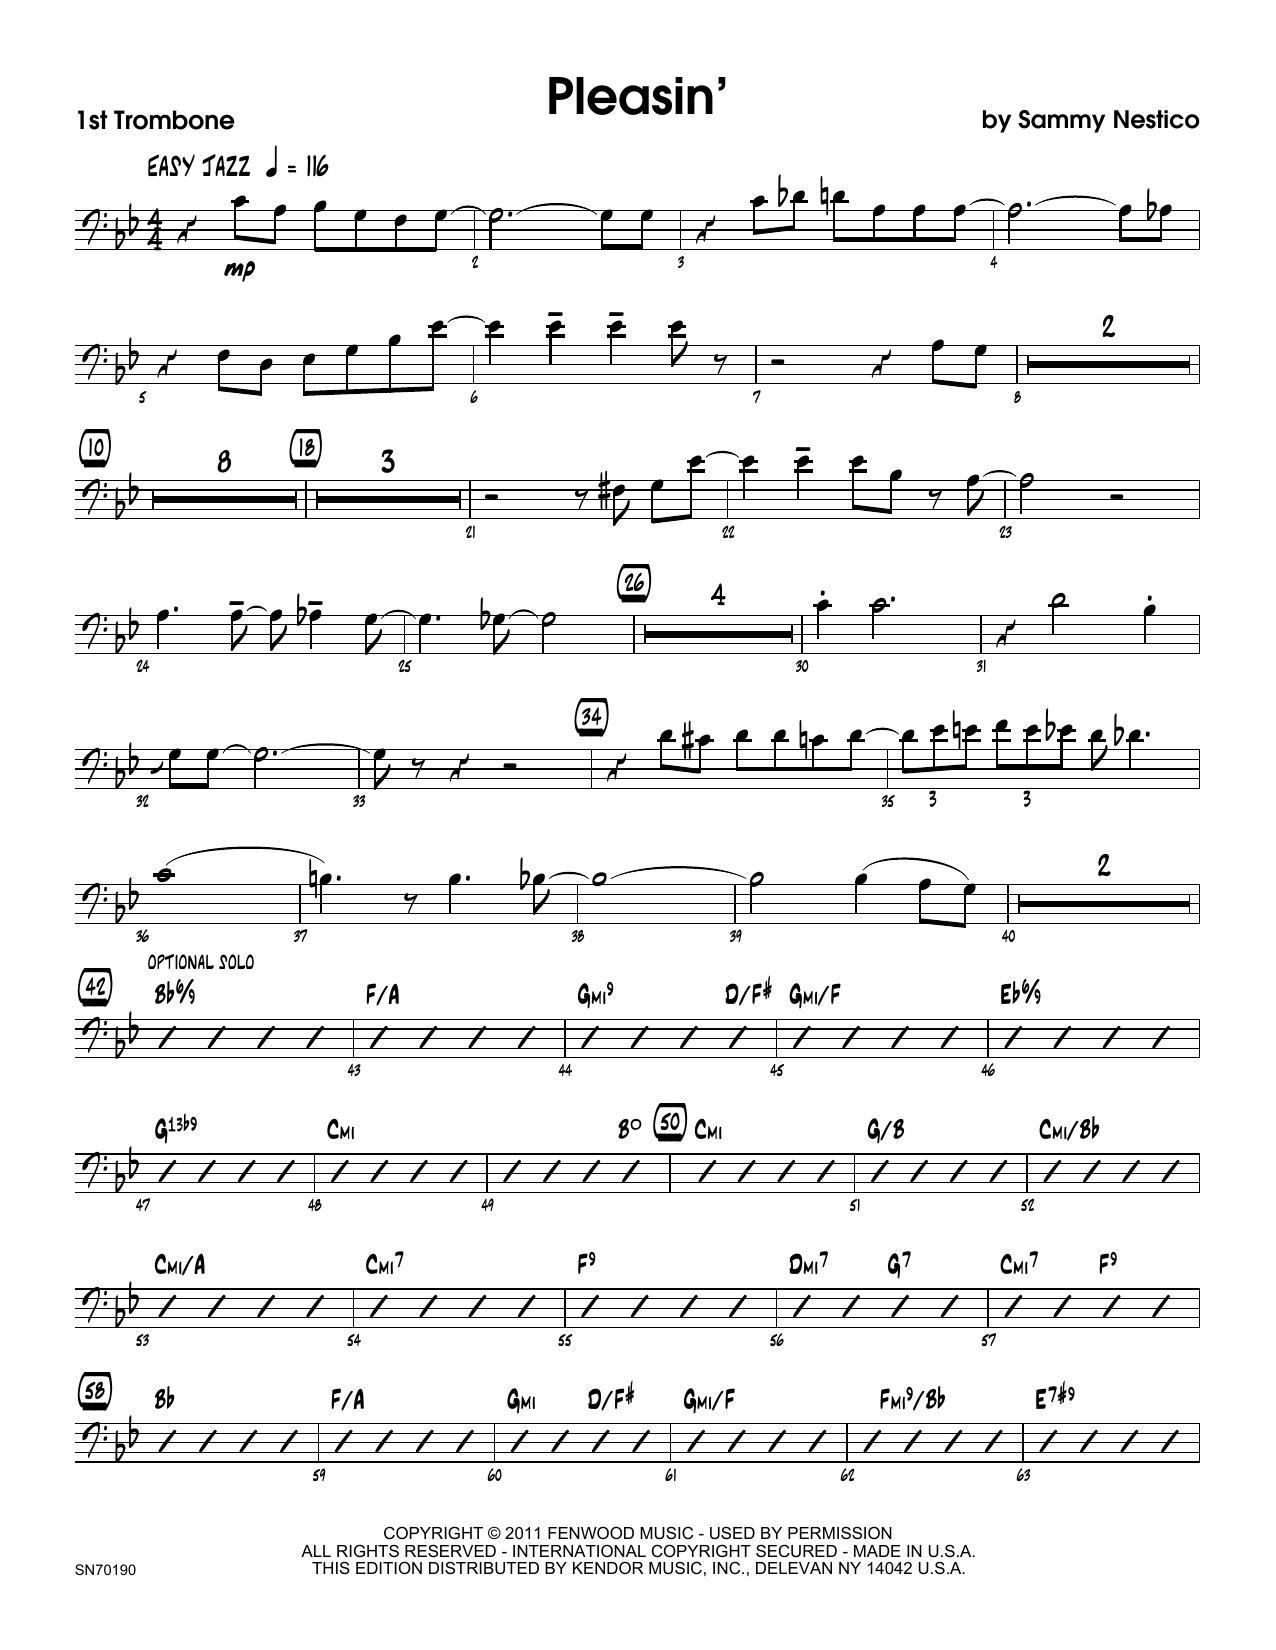 Pleasin' - 1st Trombone